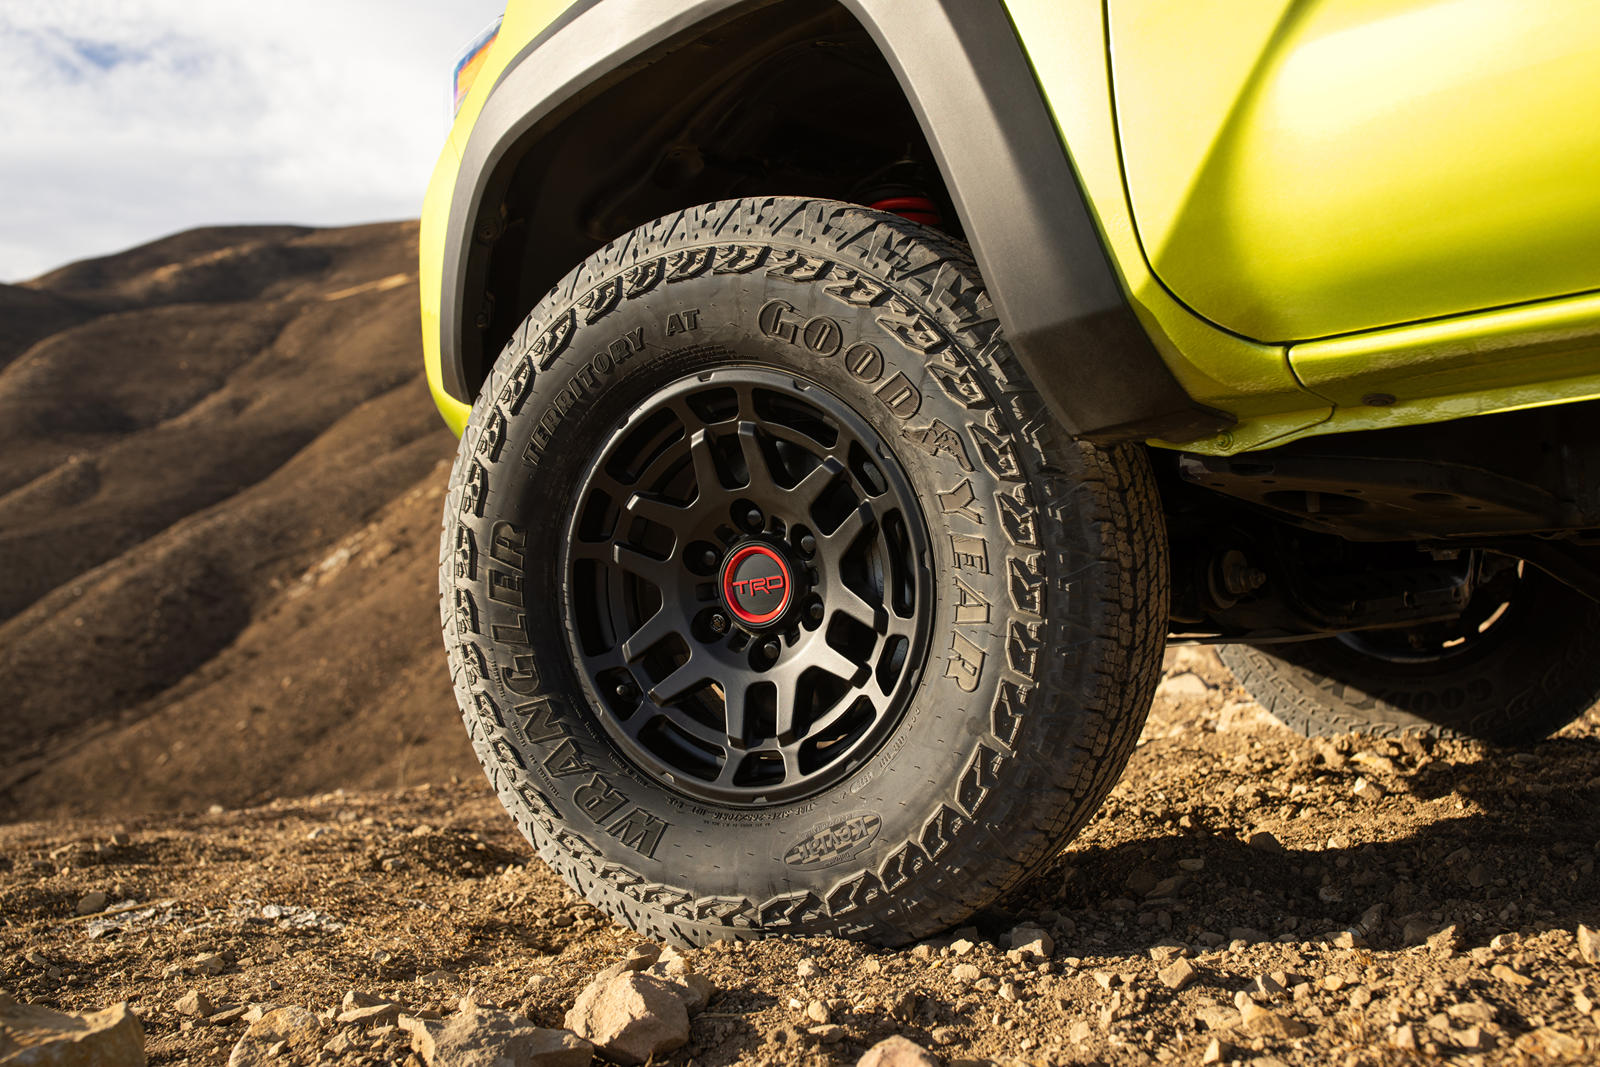 Toyota-ra-mắt-Tacoma-TRD-Pro-2022 (3).jpg